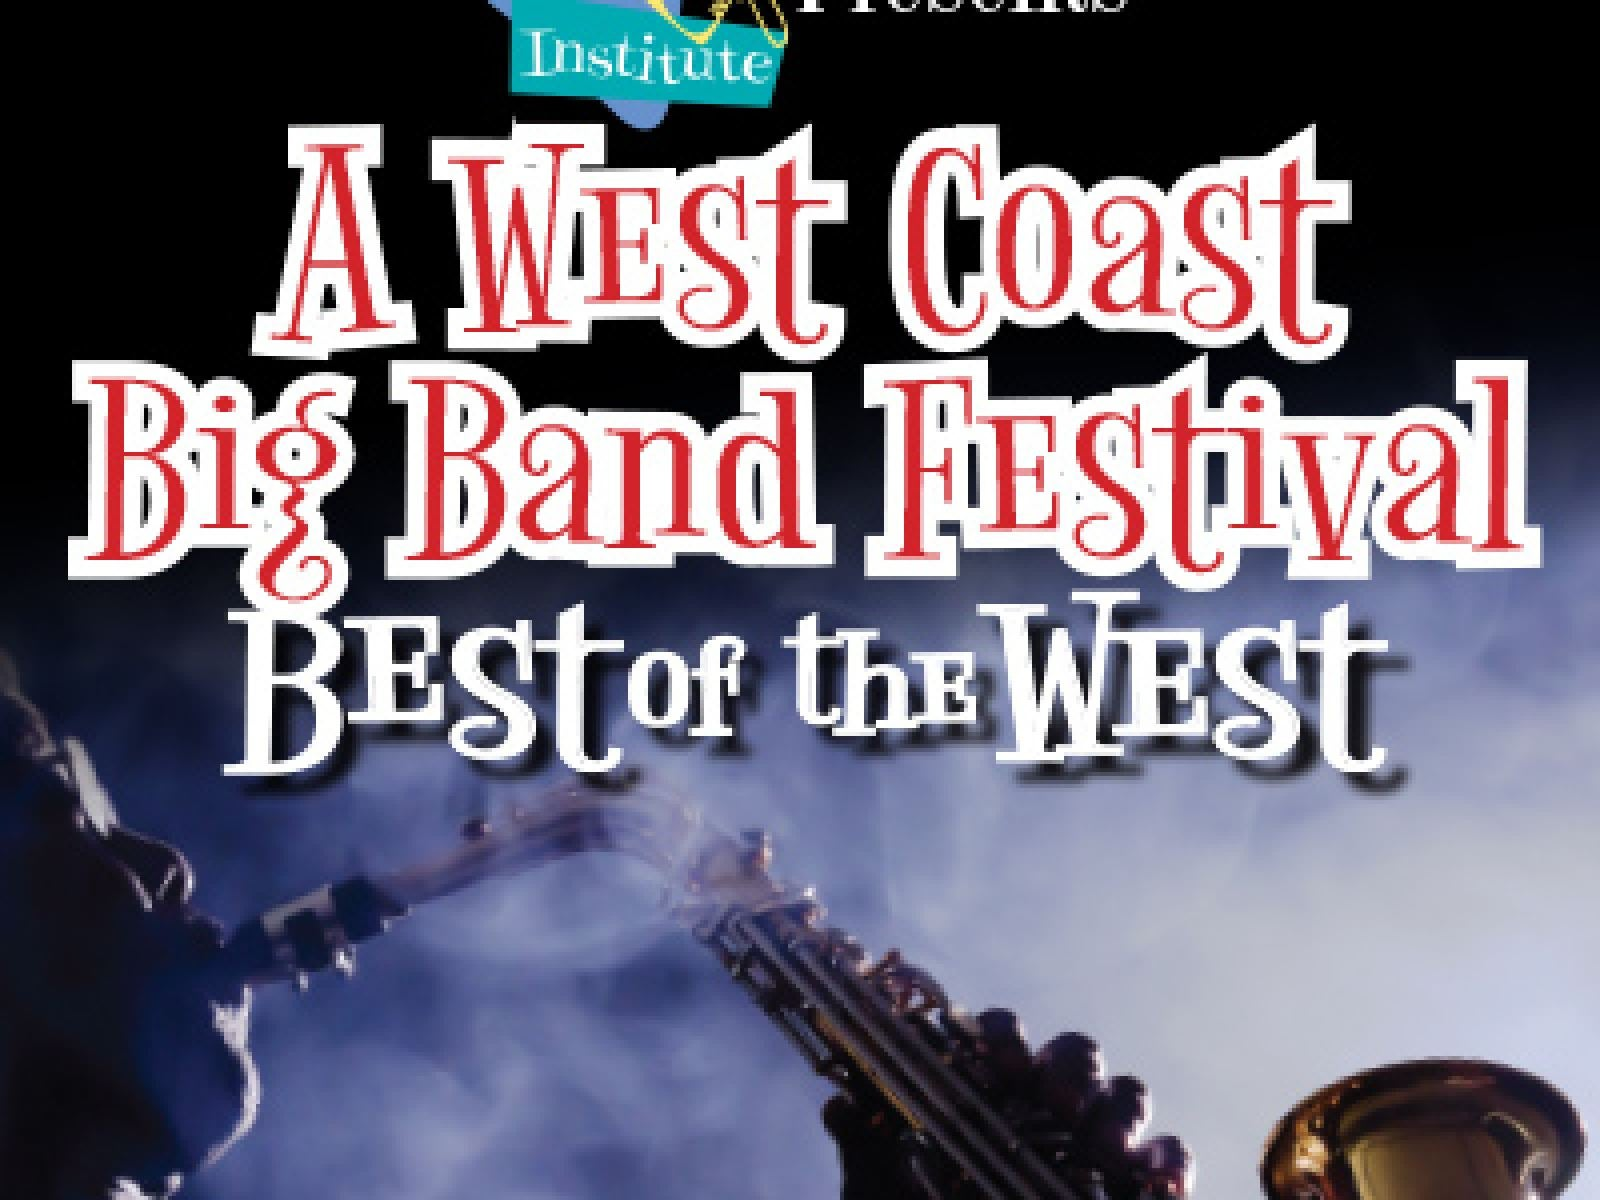 Los Angeles Jazz Institute Big Band Festival